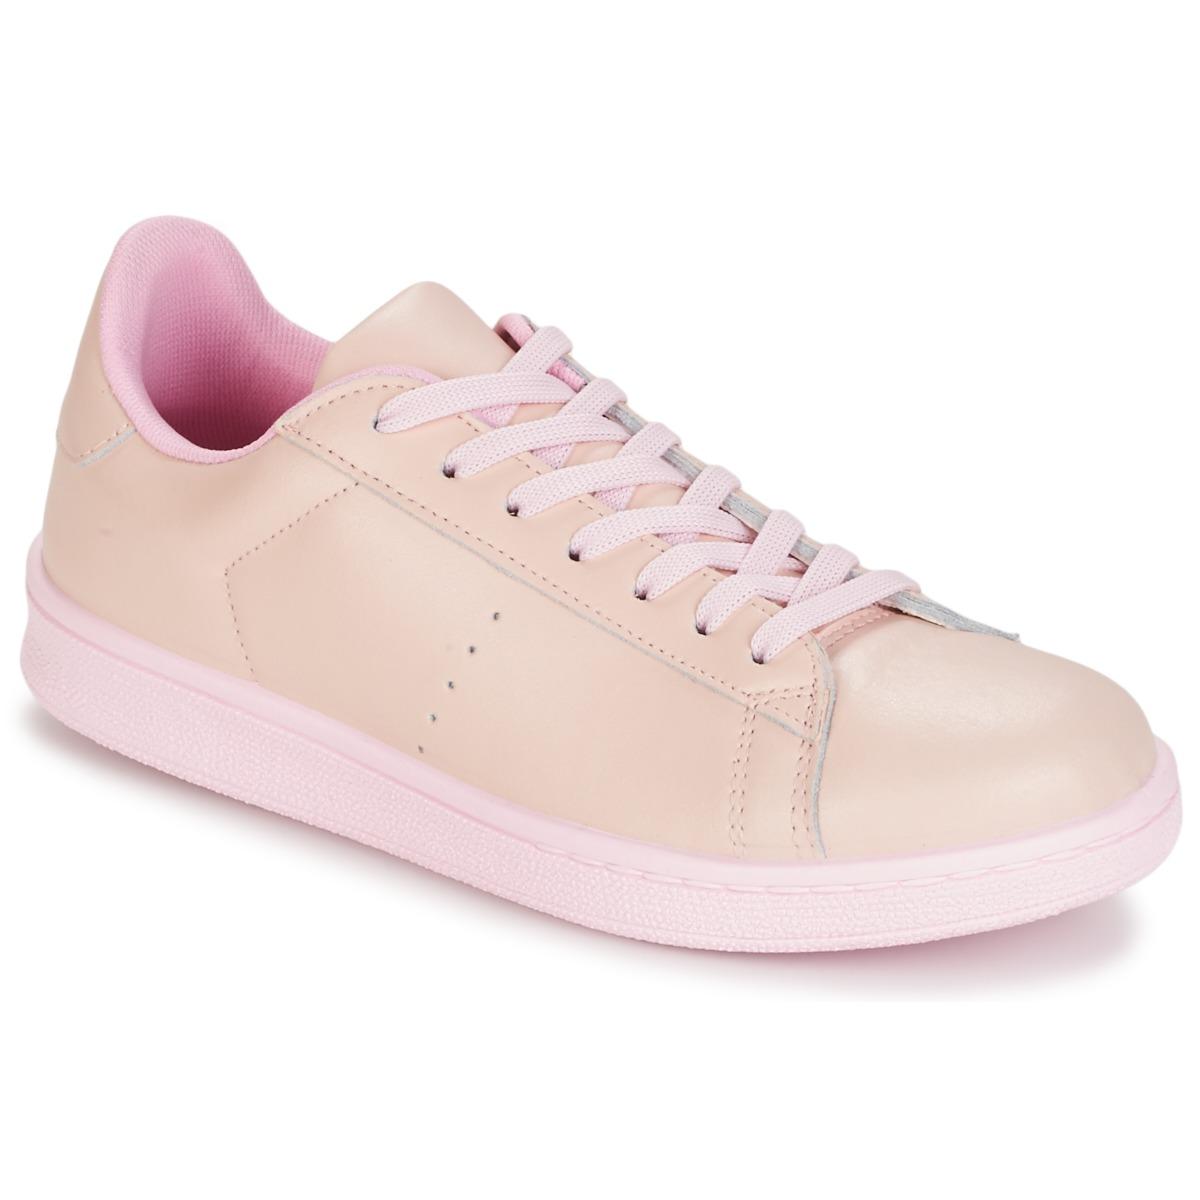 Yurban Sneakers basse EZIME spartoo-shoes rosa Sportivo